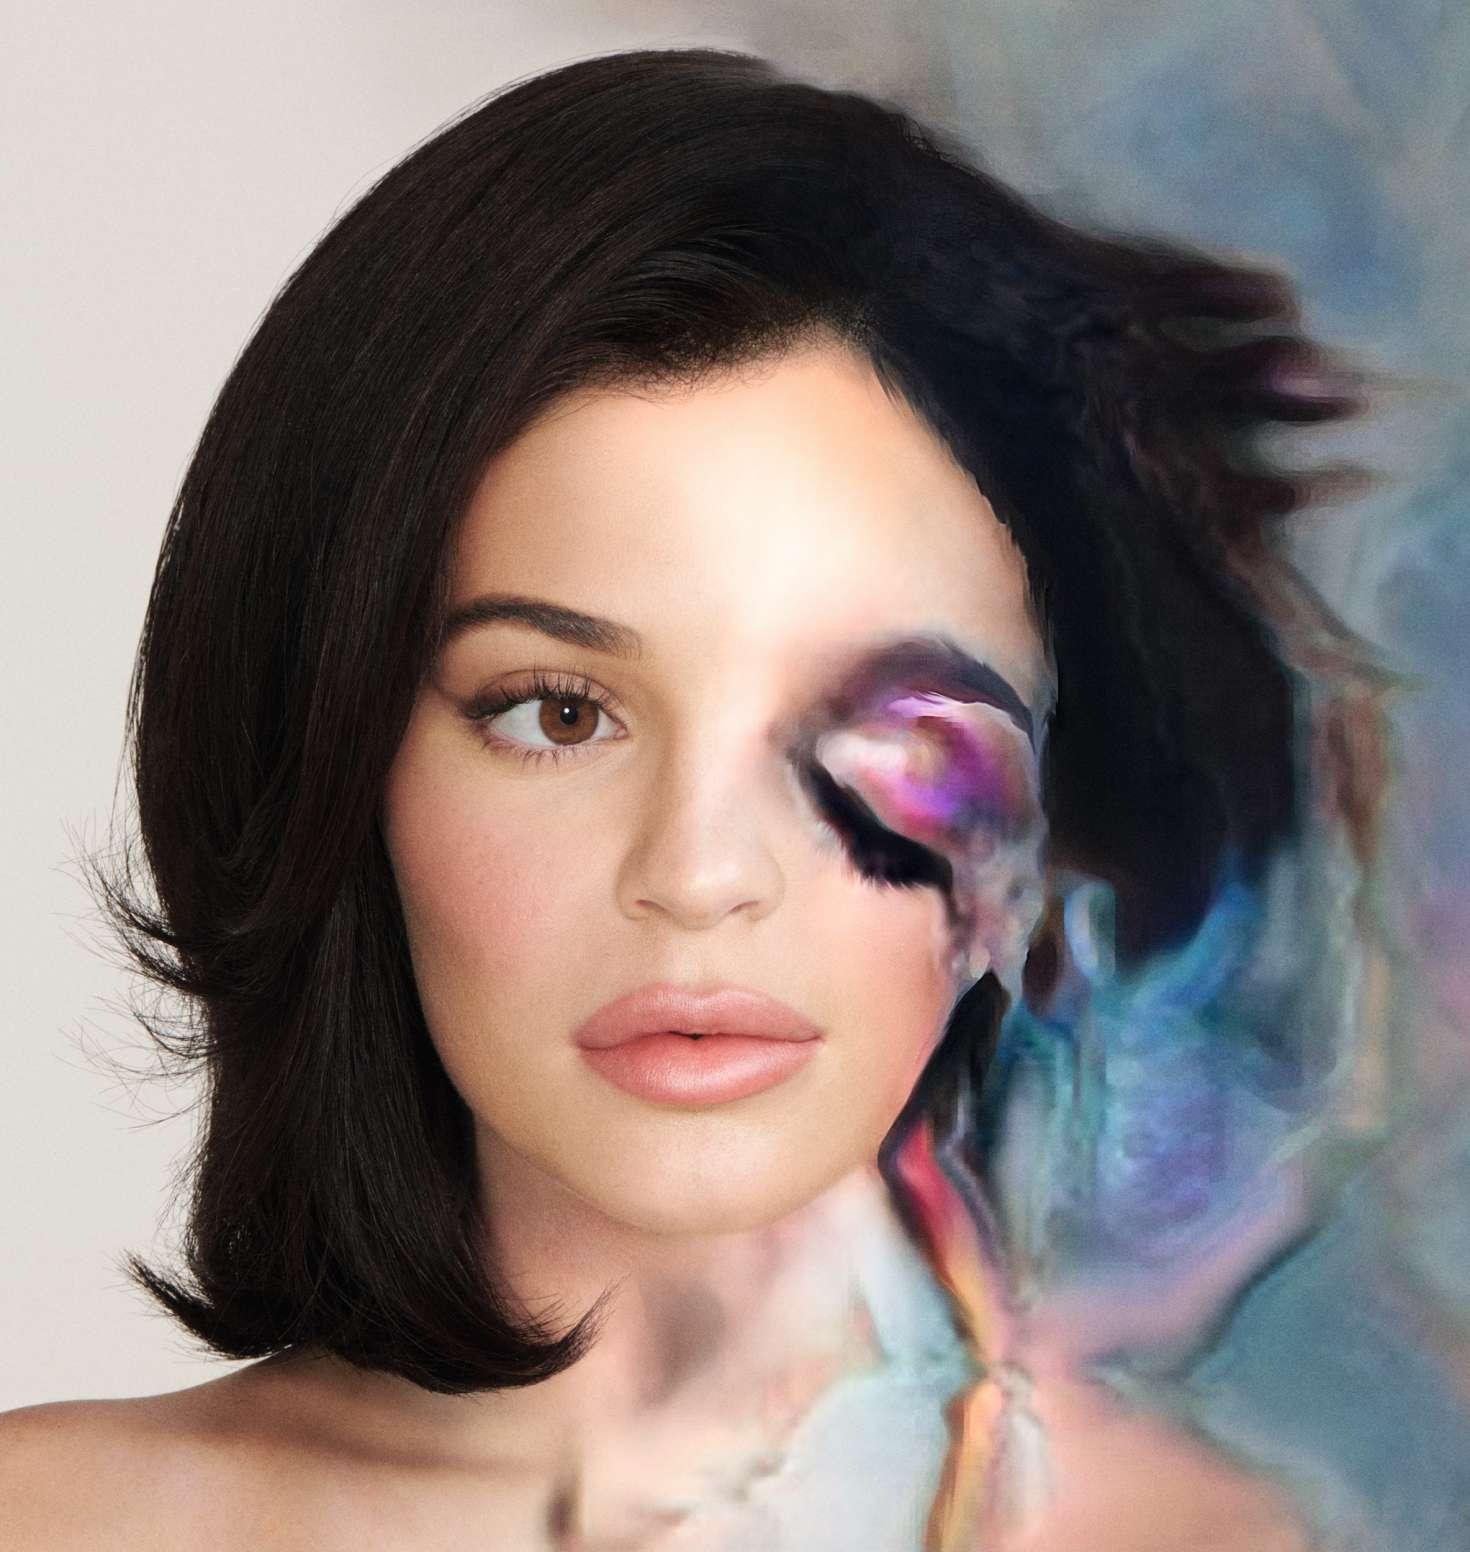 Kylie Jenner - Dazed Beauty Issue Zero 2019